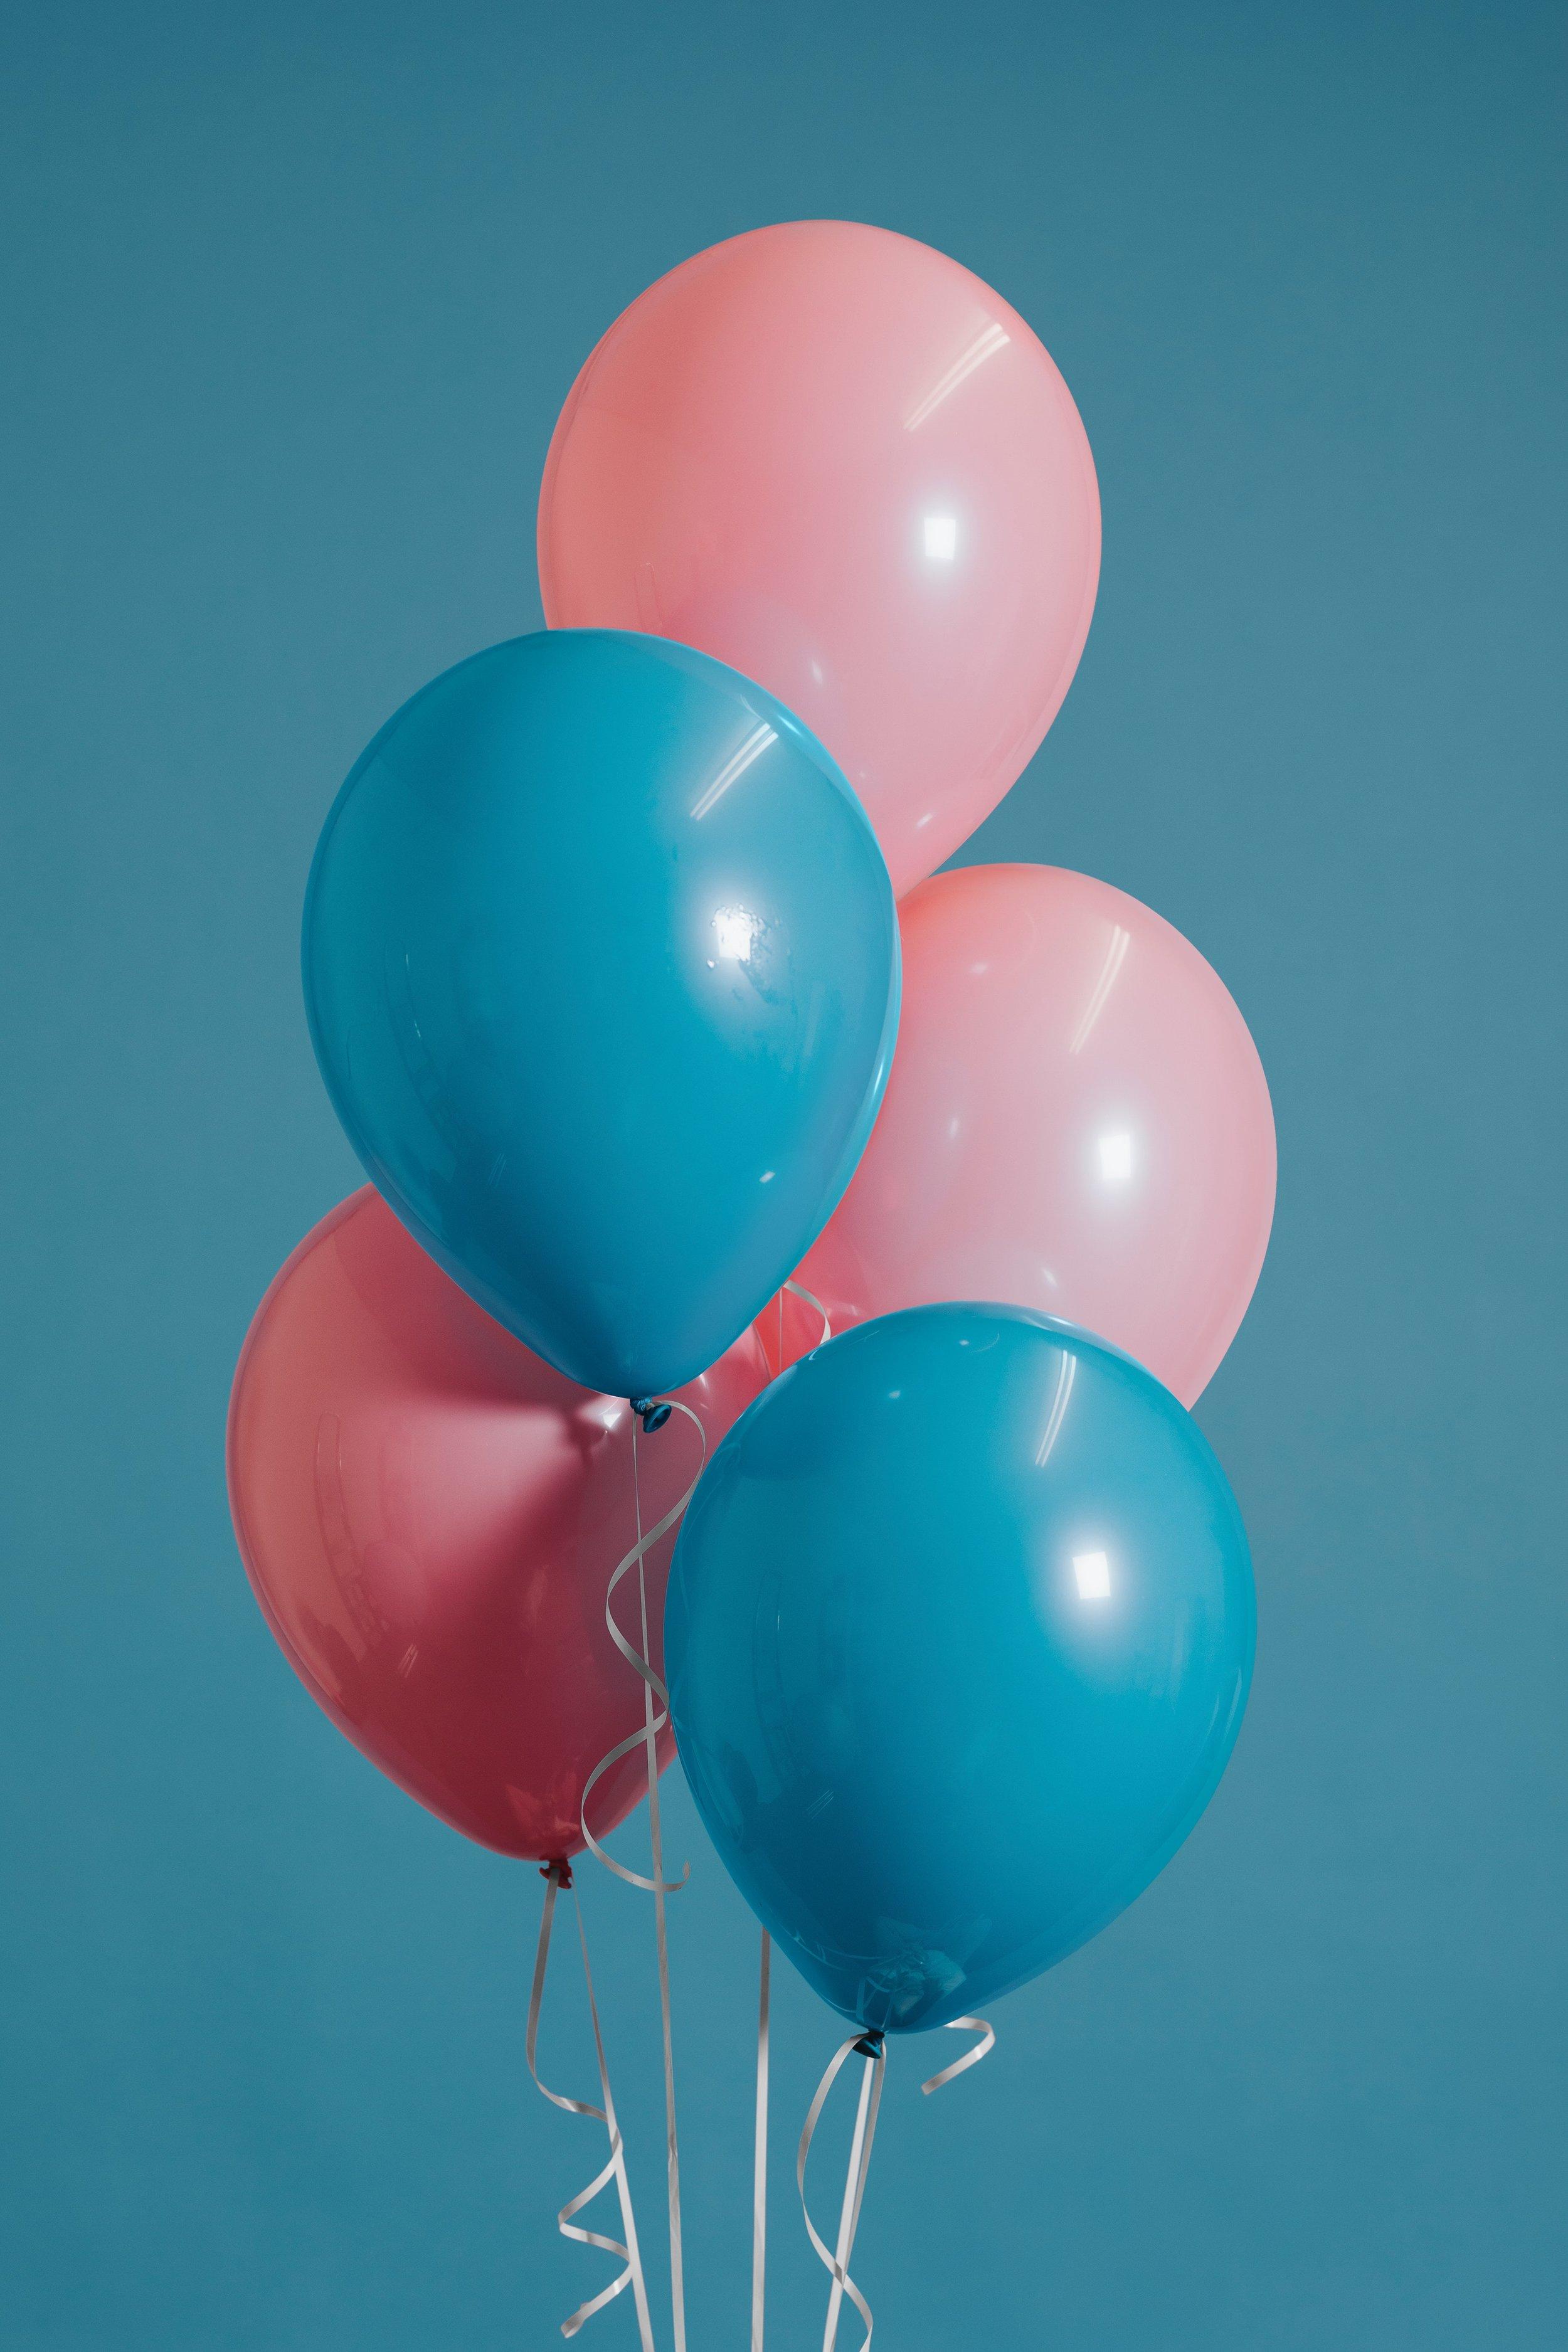 air-baby-blue-baby-pink-1851361.jpg